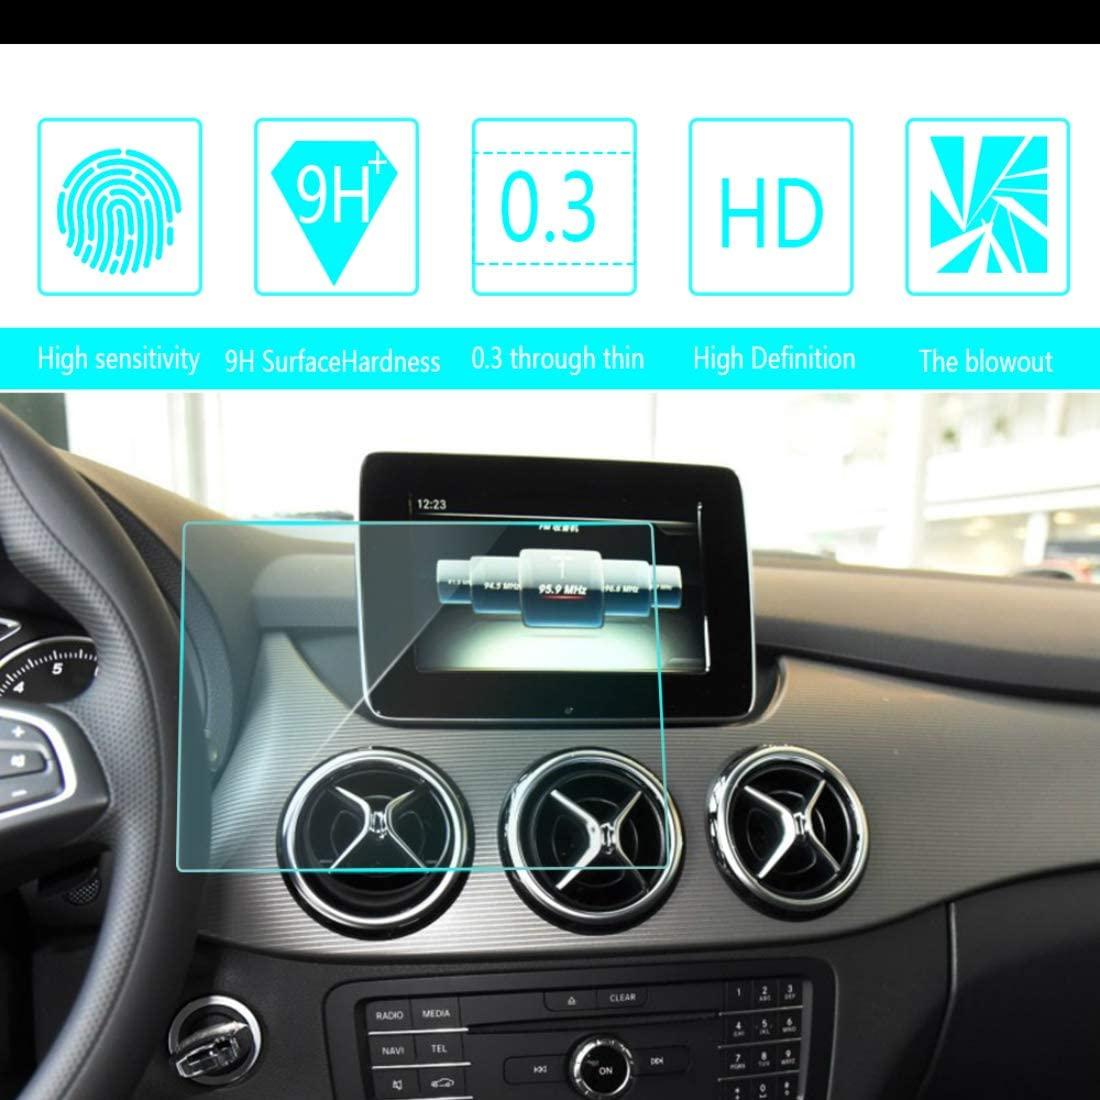 for Mercedes Benz B180 2016 7-Inch 150x90mm Car Screen Tempered Film Navigation Screen Protector HD Clear 9H Hardness Anti-Fingerprint Anti-Scratch